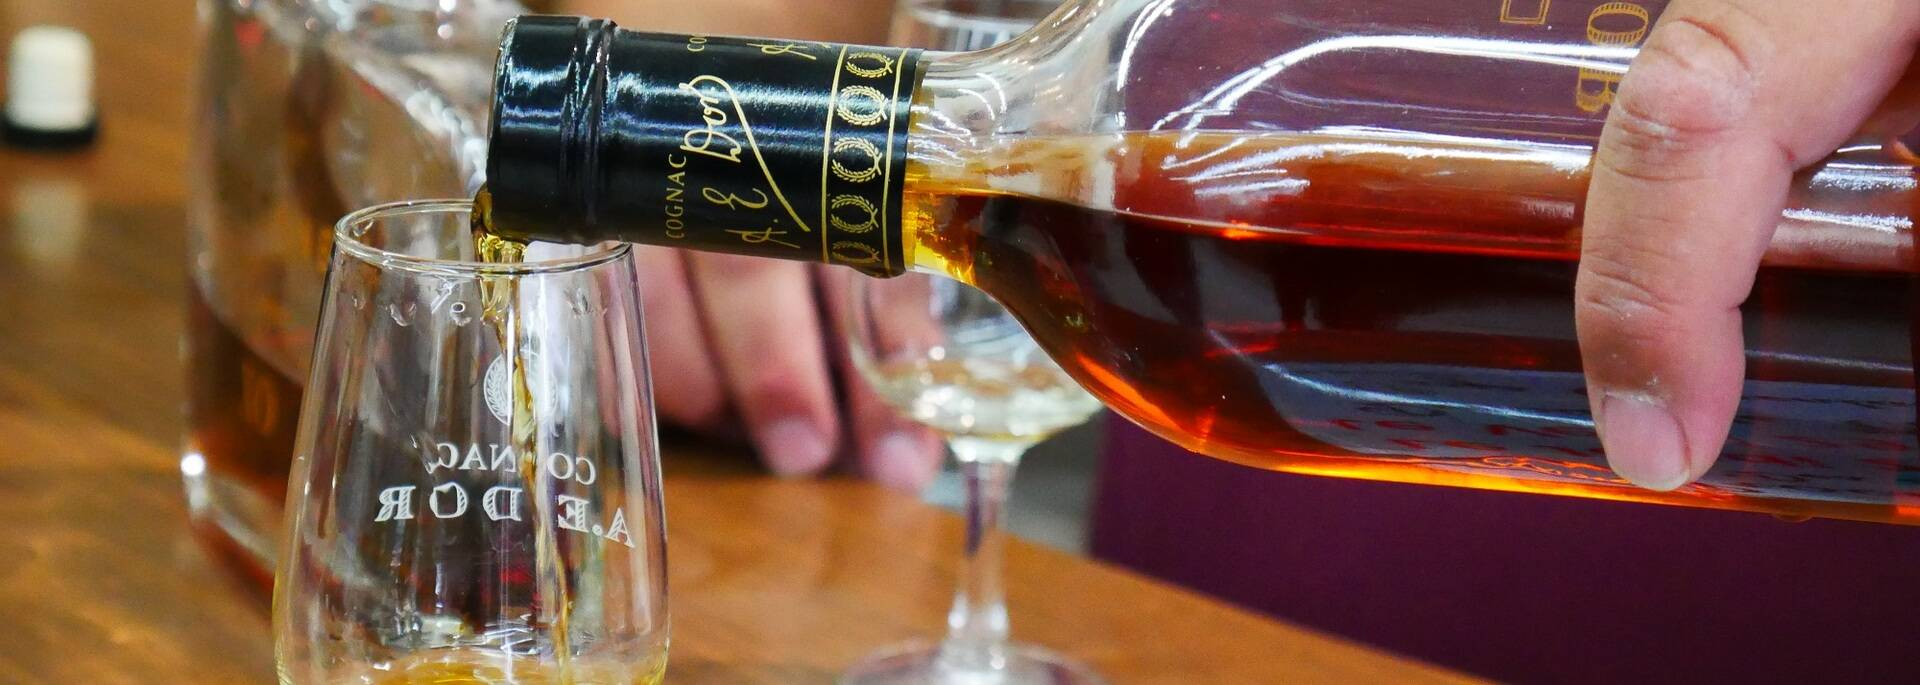 Dégustation de cognac - ©P.Migaud / FDHPA17